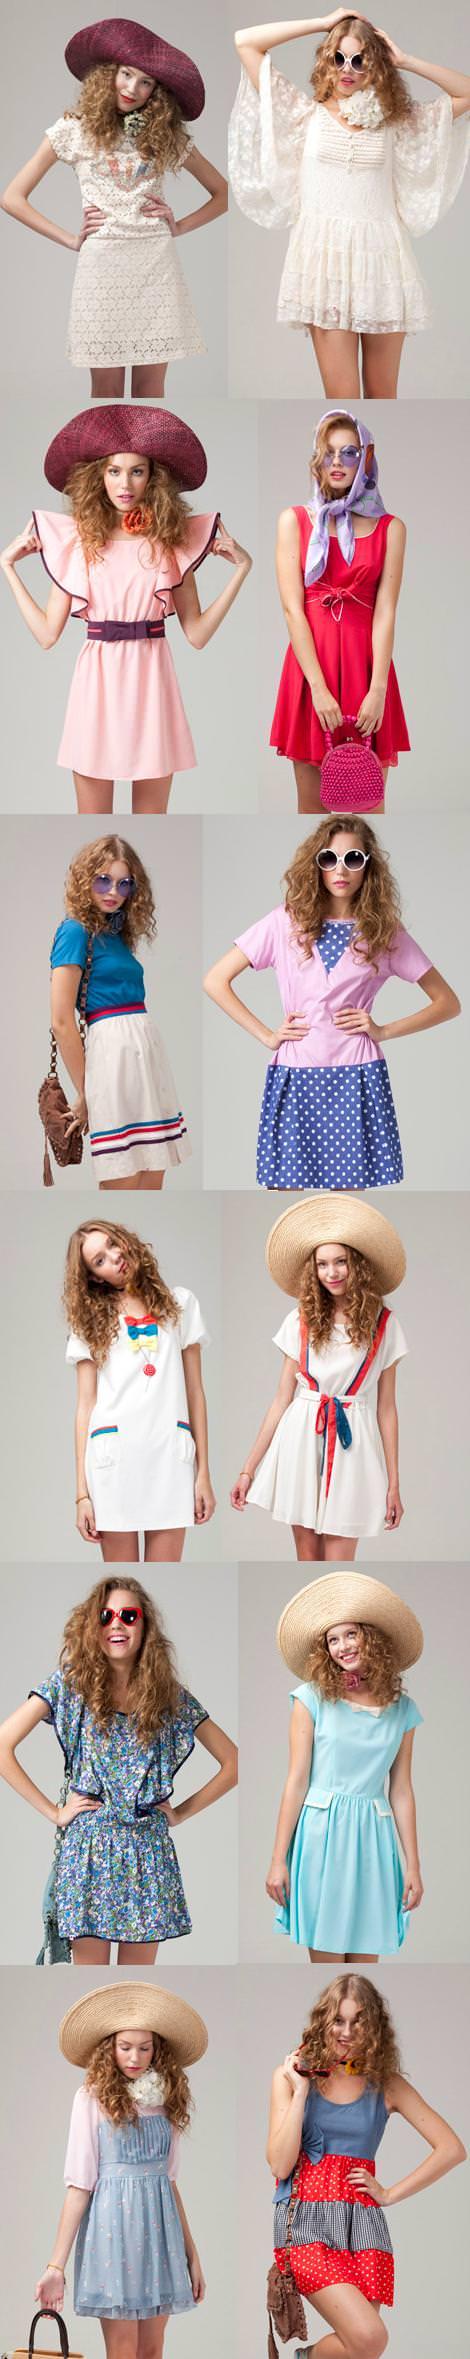 Vestidos de Kling primavera 2011